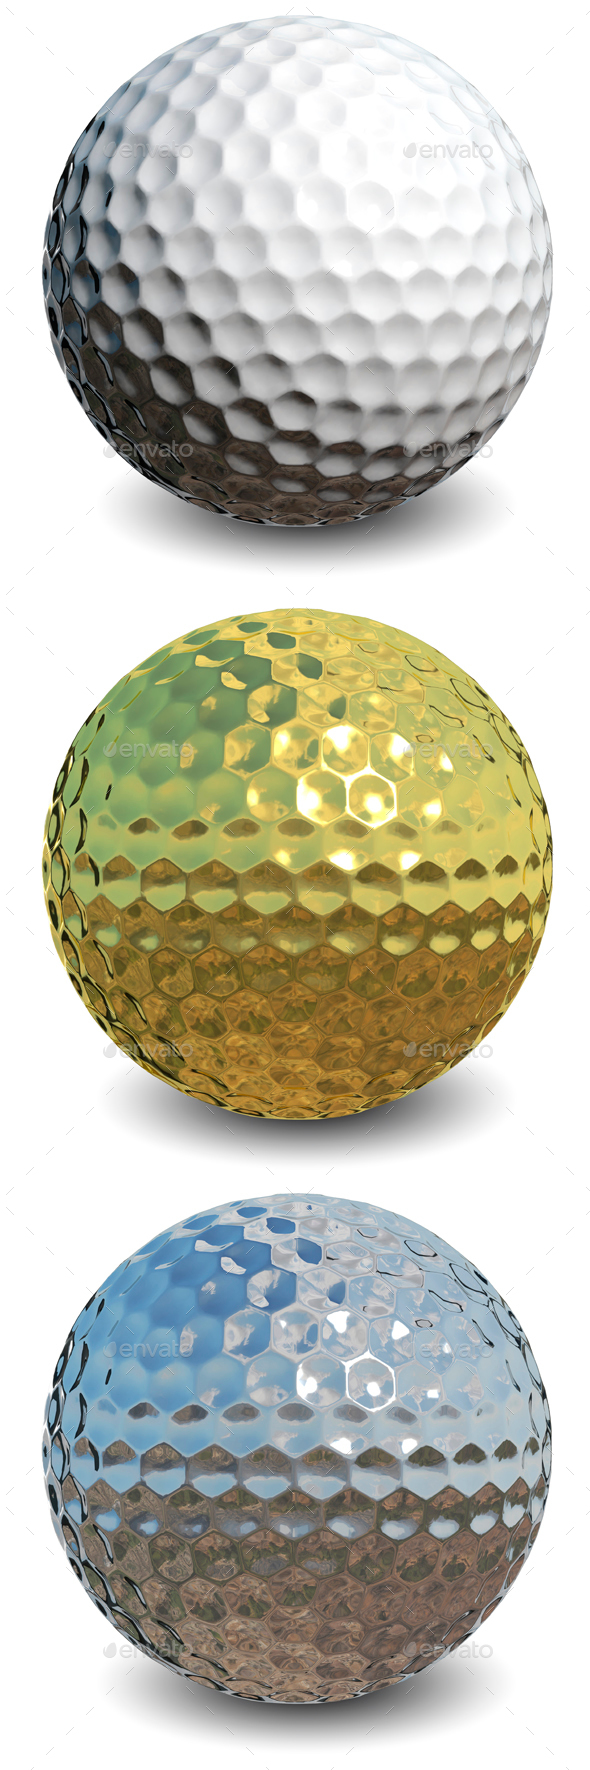 Golf ball - Objects 3D Renders